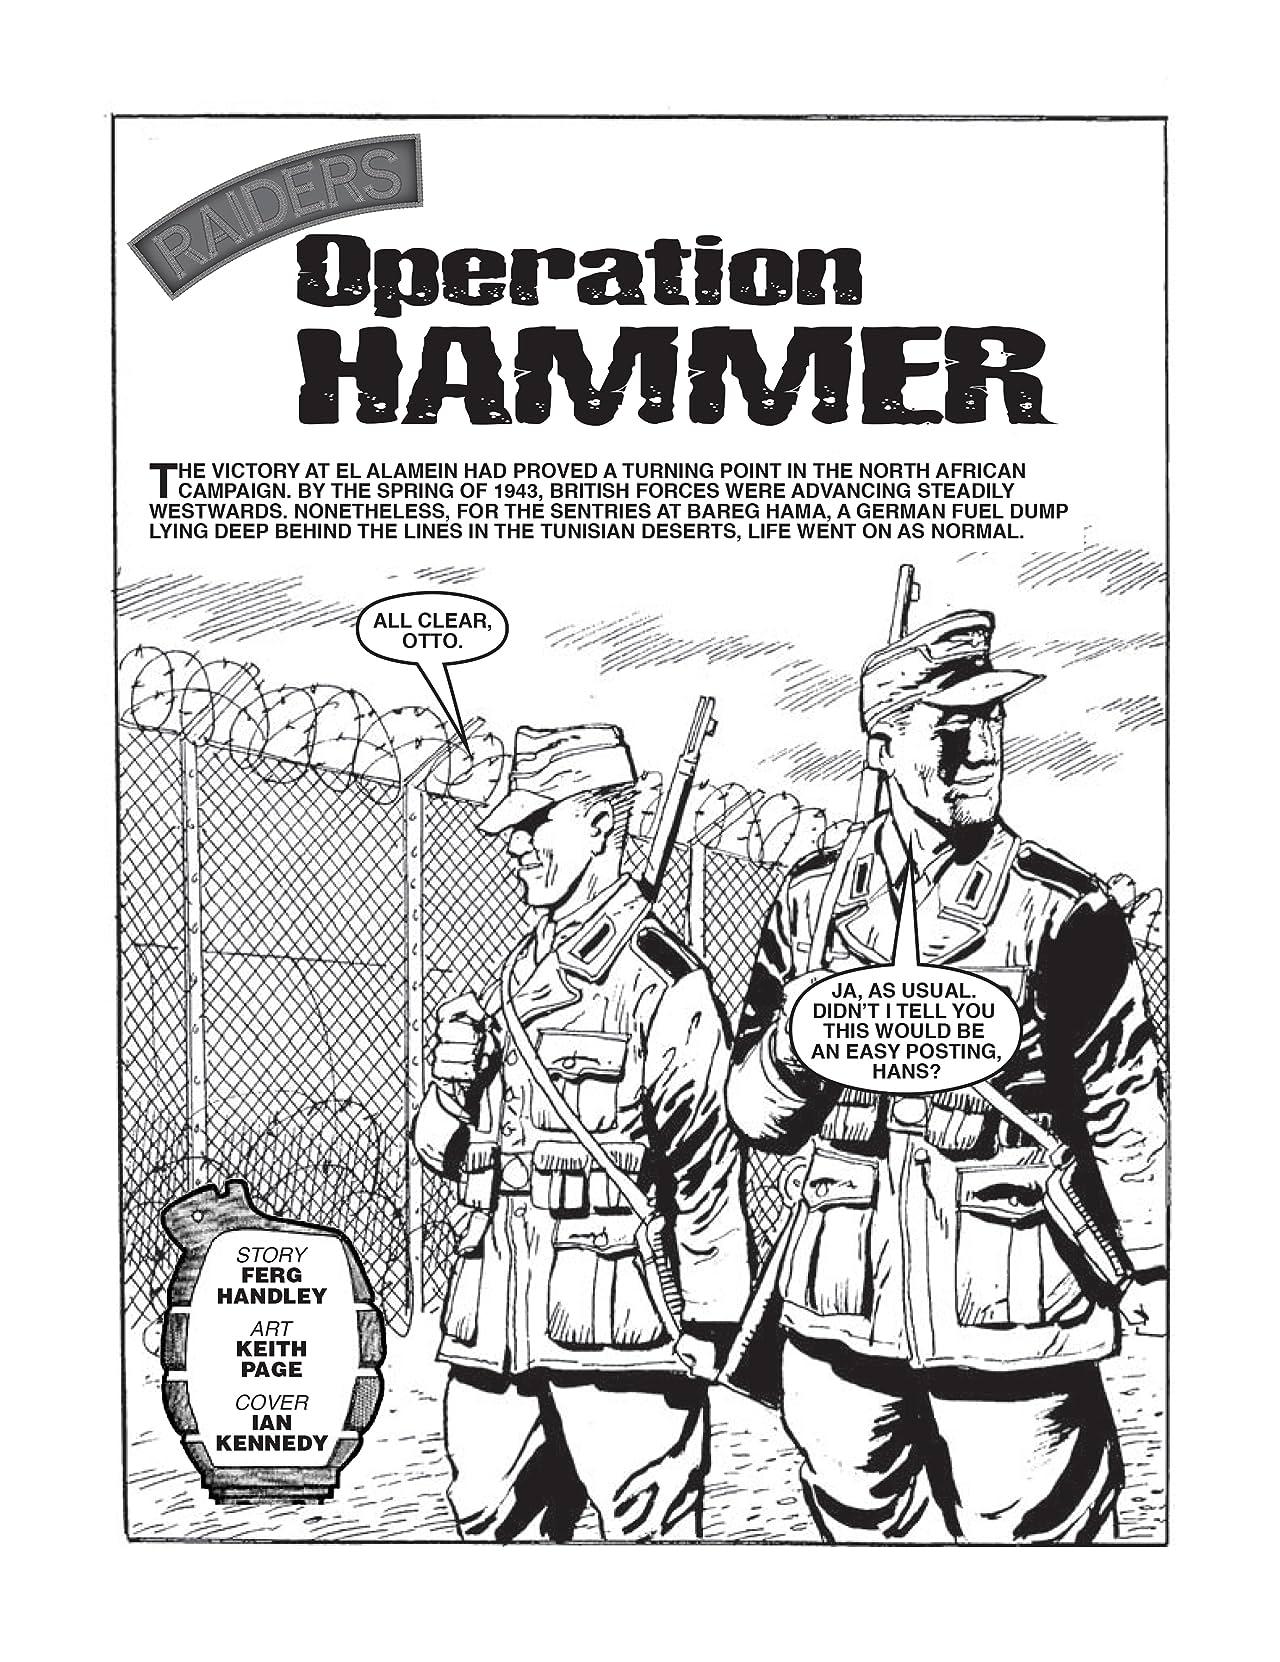 Commando #4355: Raiders: Operation Hammer